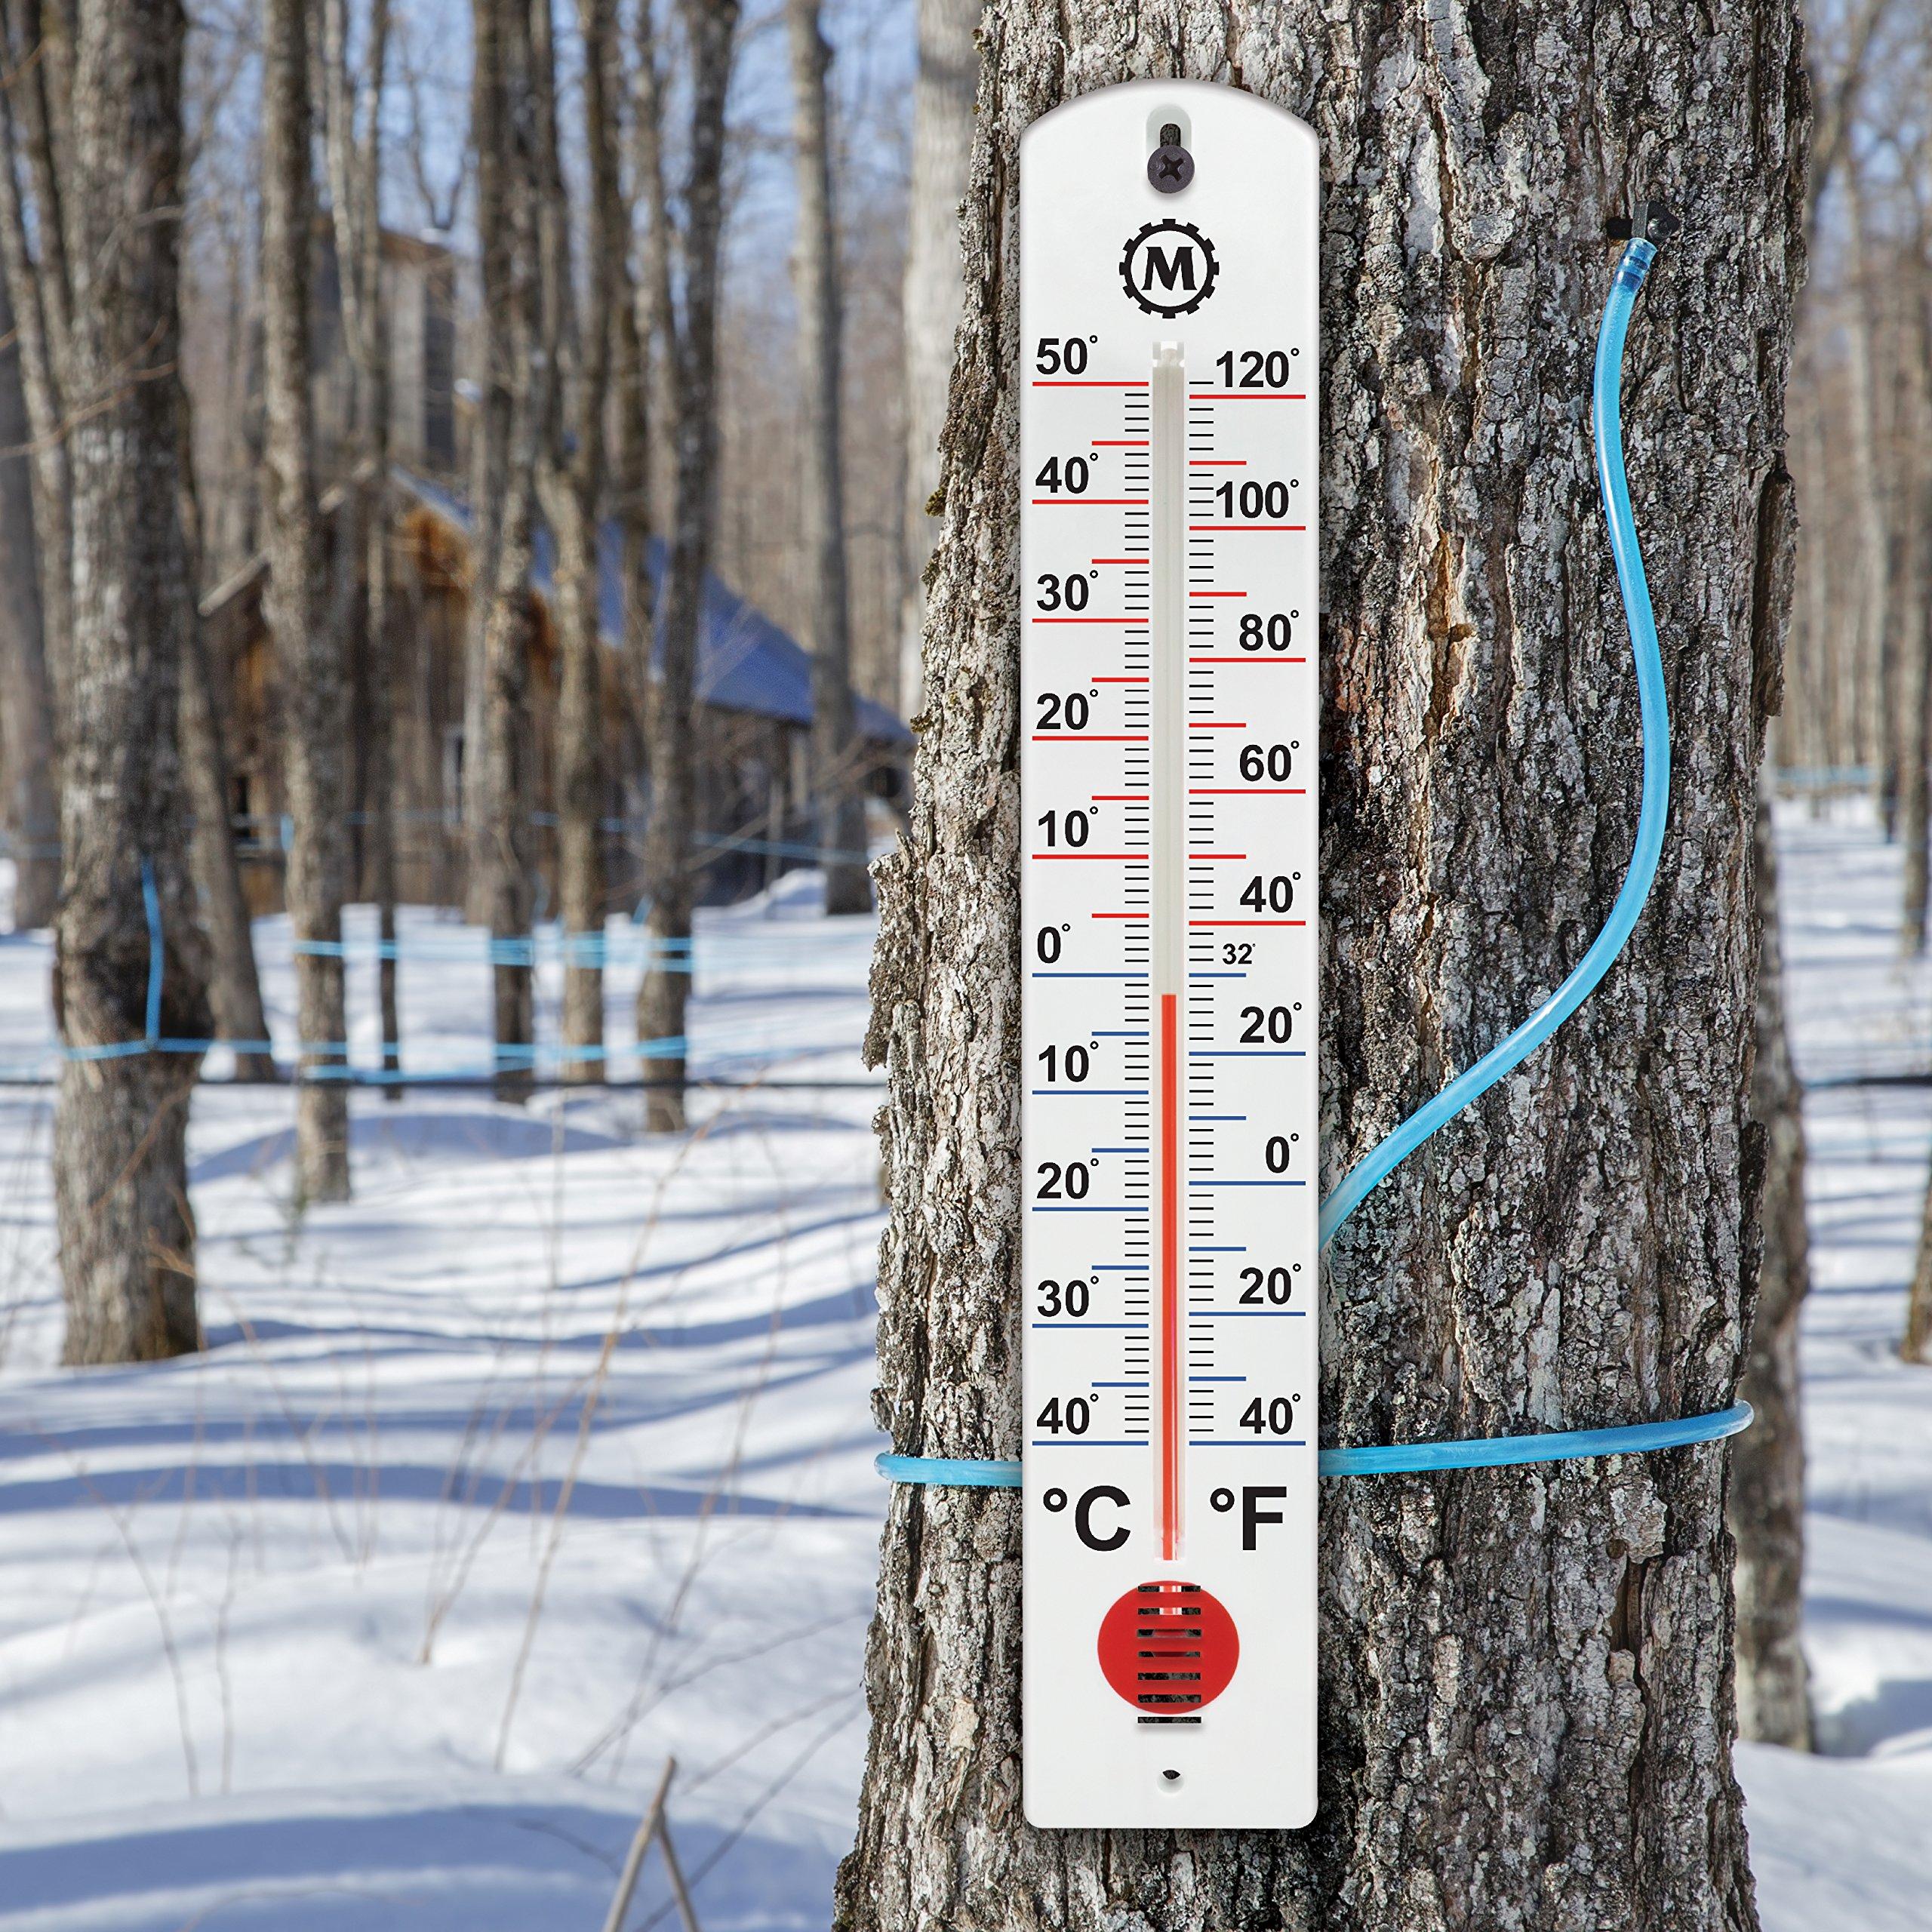 MARATHON BA030001-5 Vertical Outdoor Thermometer - 16-Inch, 5 Pack by Marathon (Image #2)